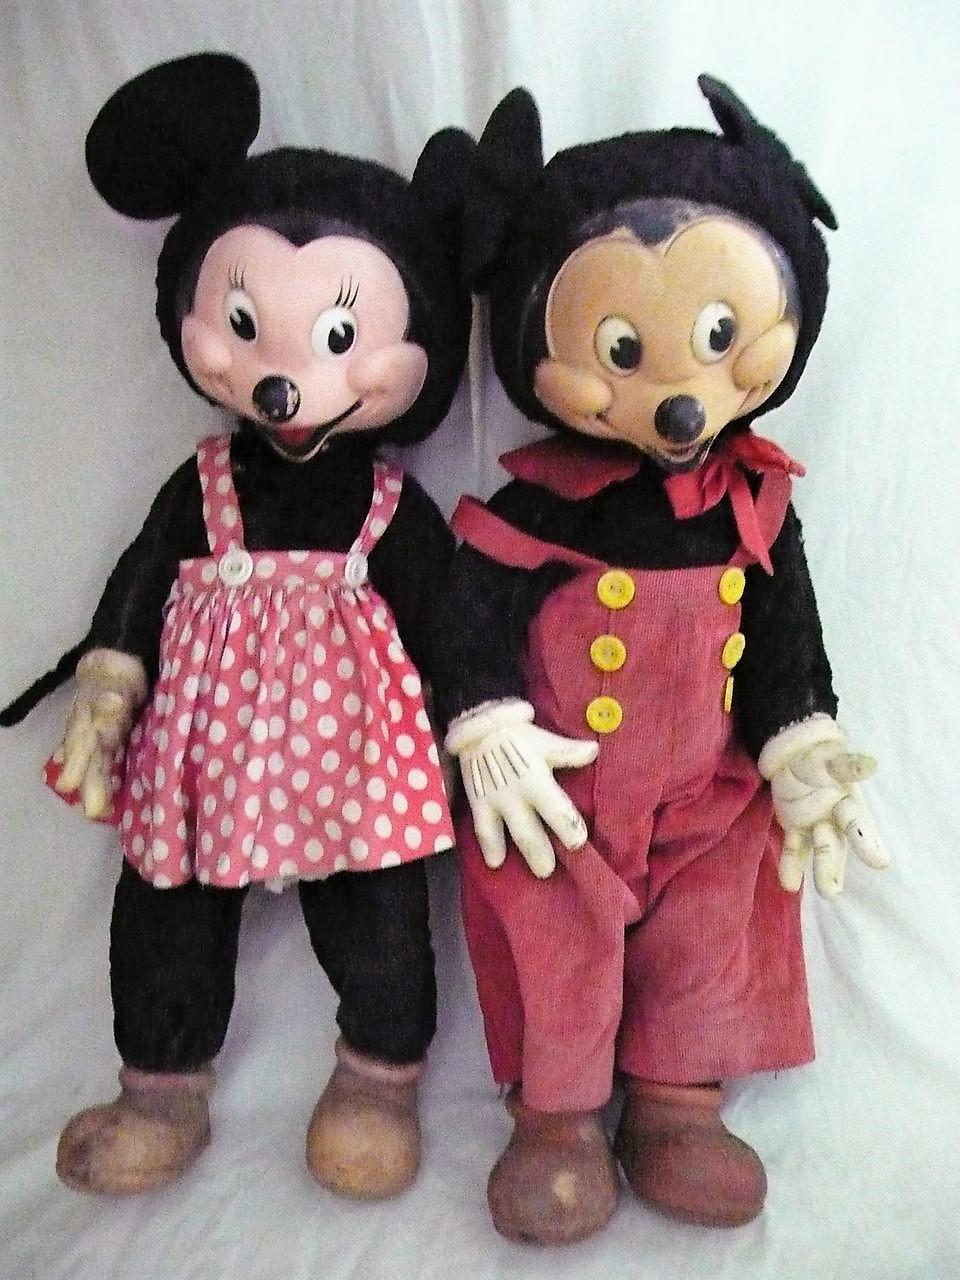 '40s Gund stuffed Mickey & Minnie Mouse toys